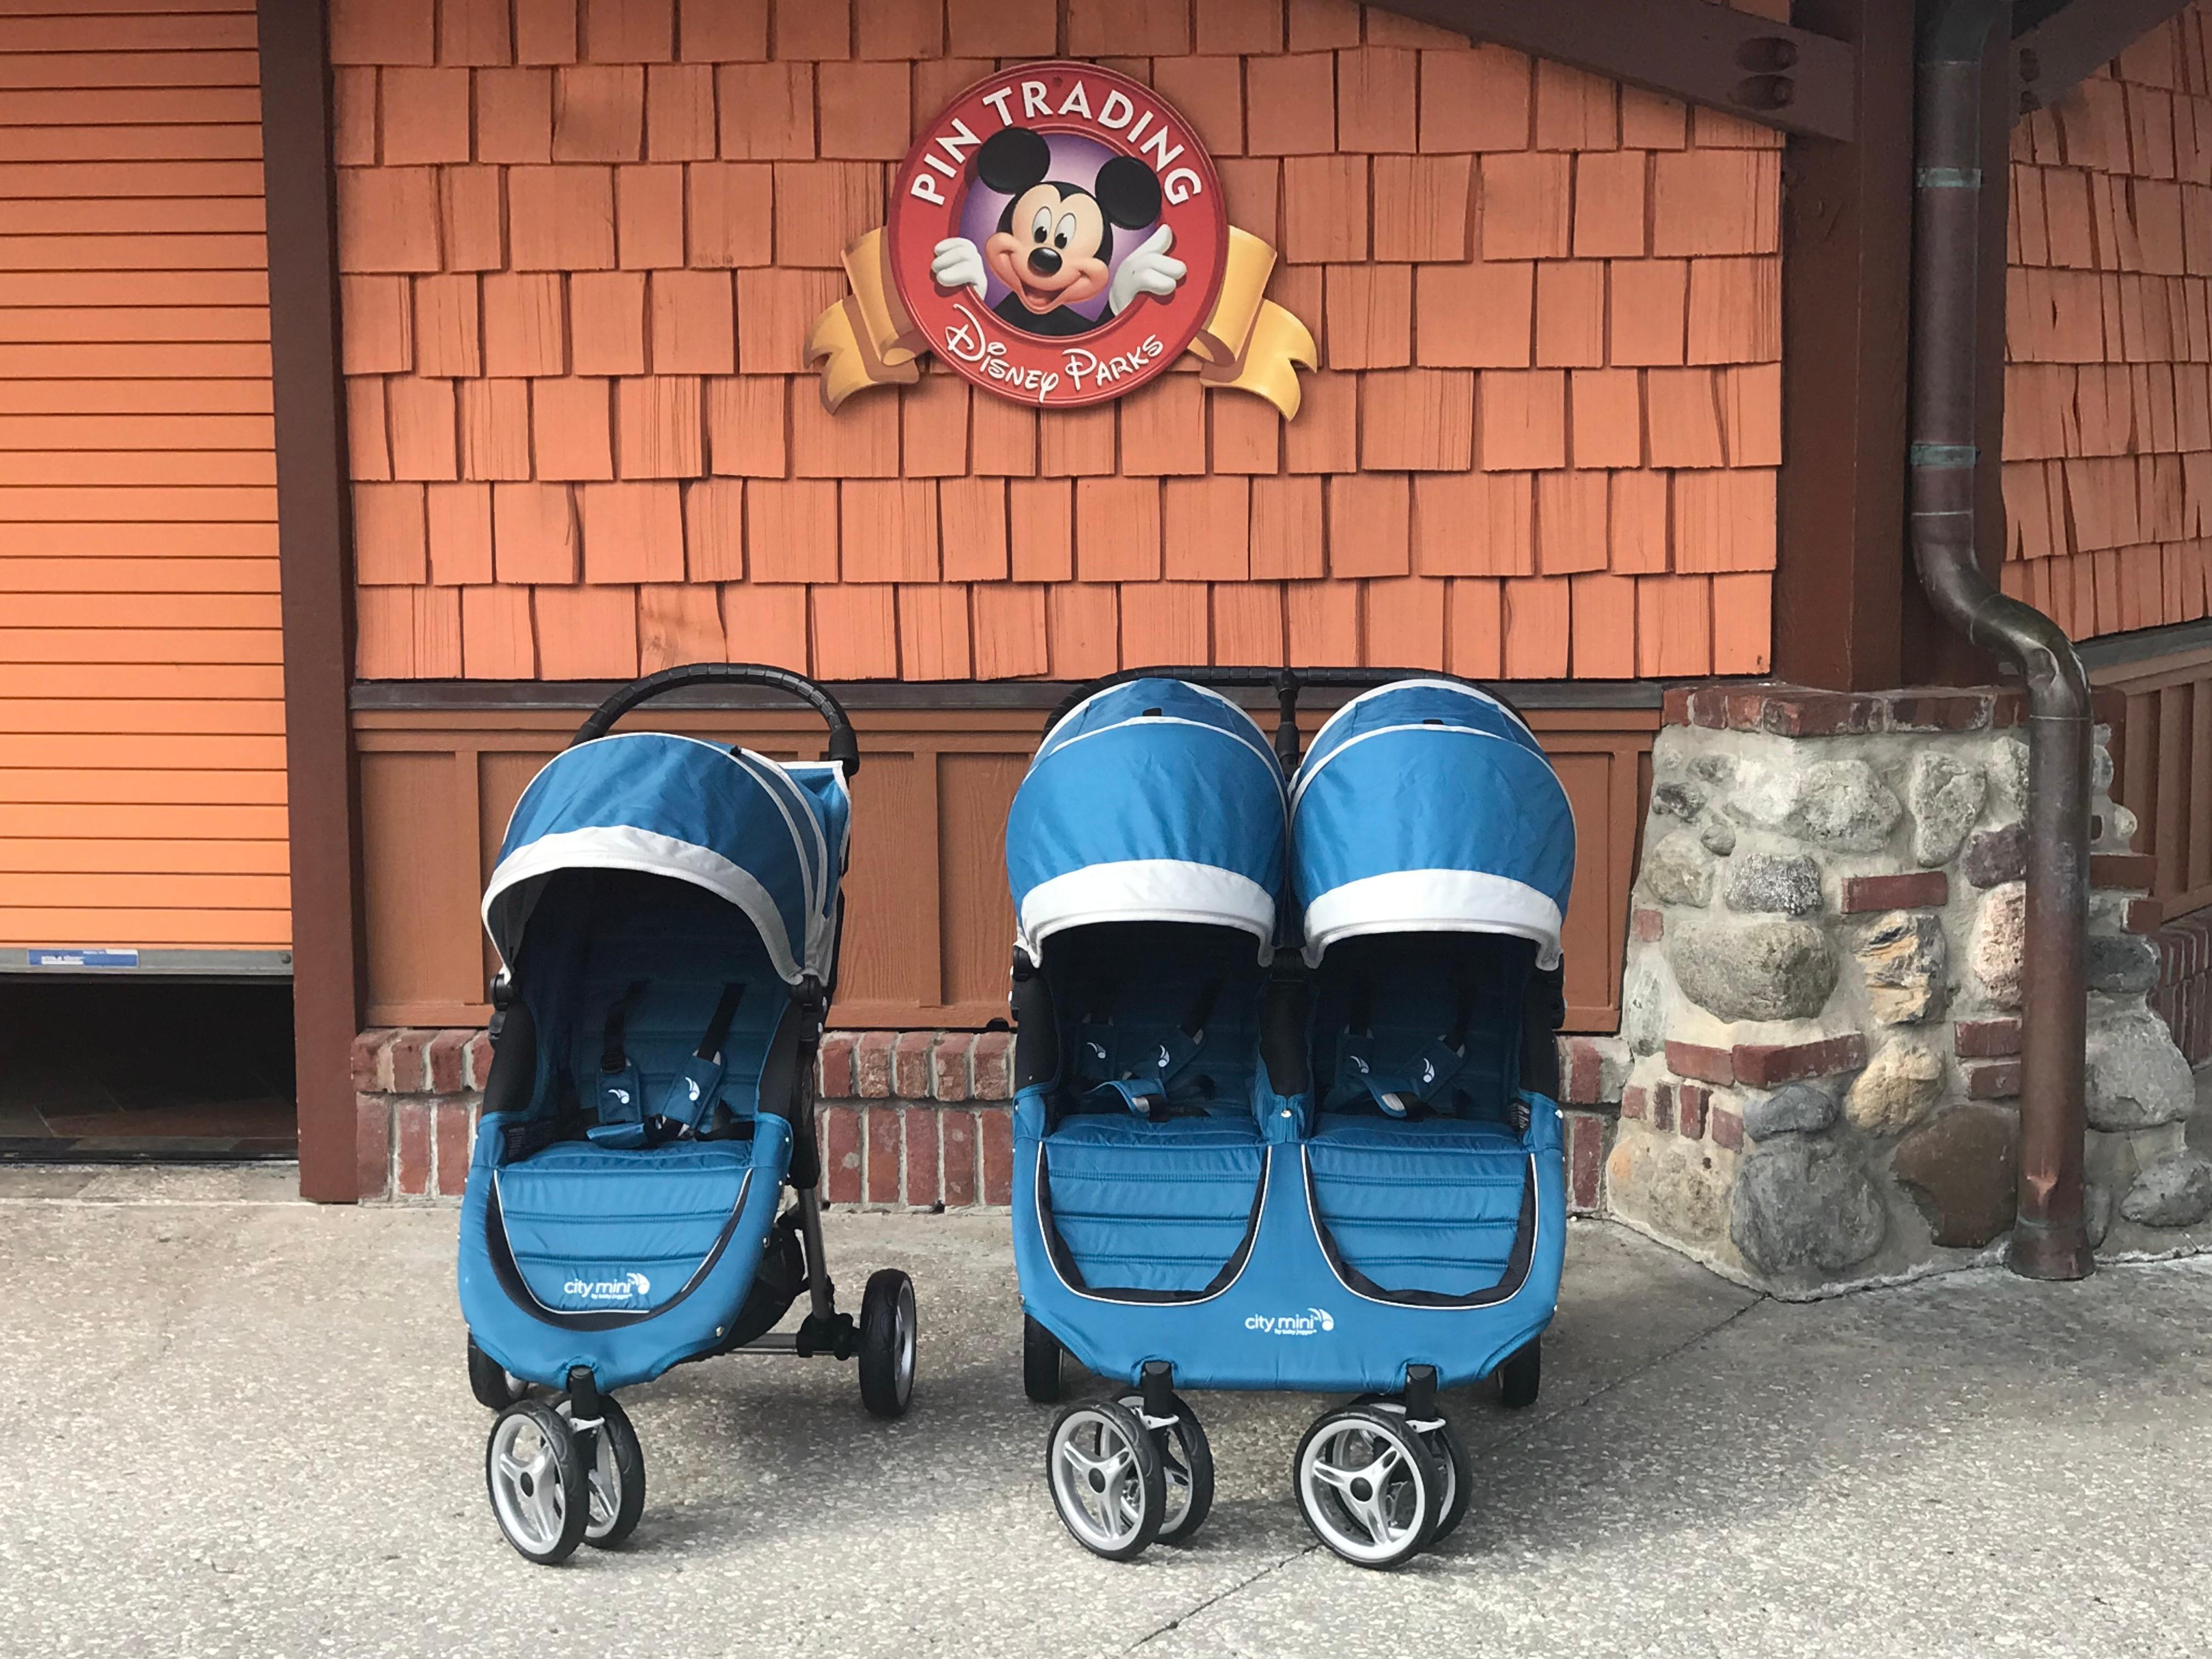 Stroller Rentals Disney image 75